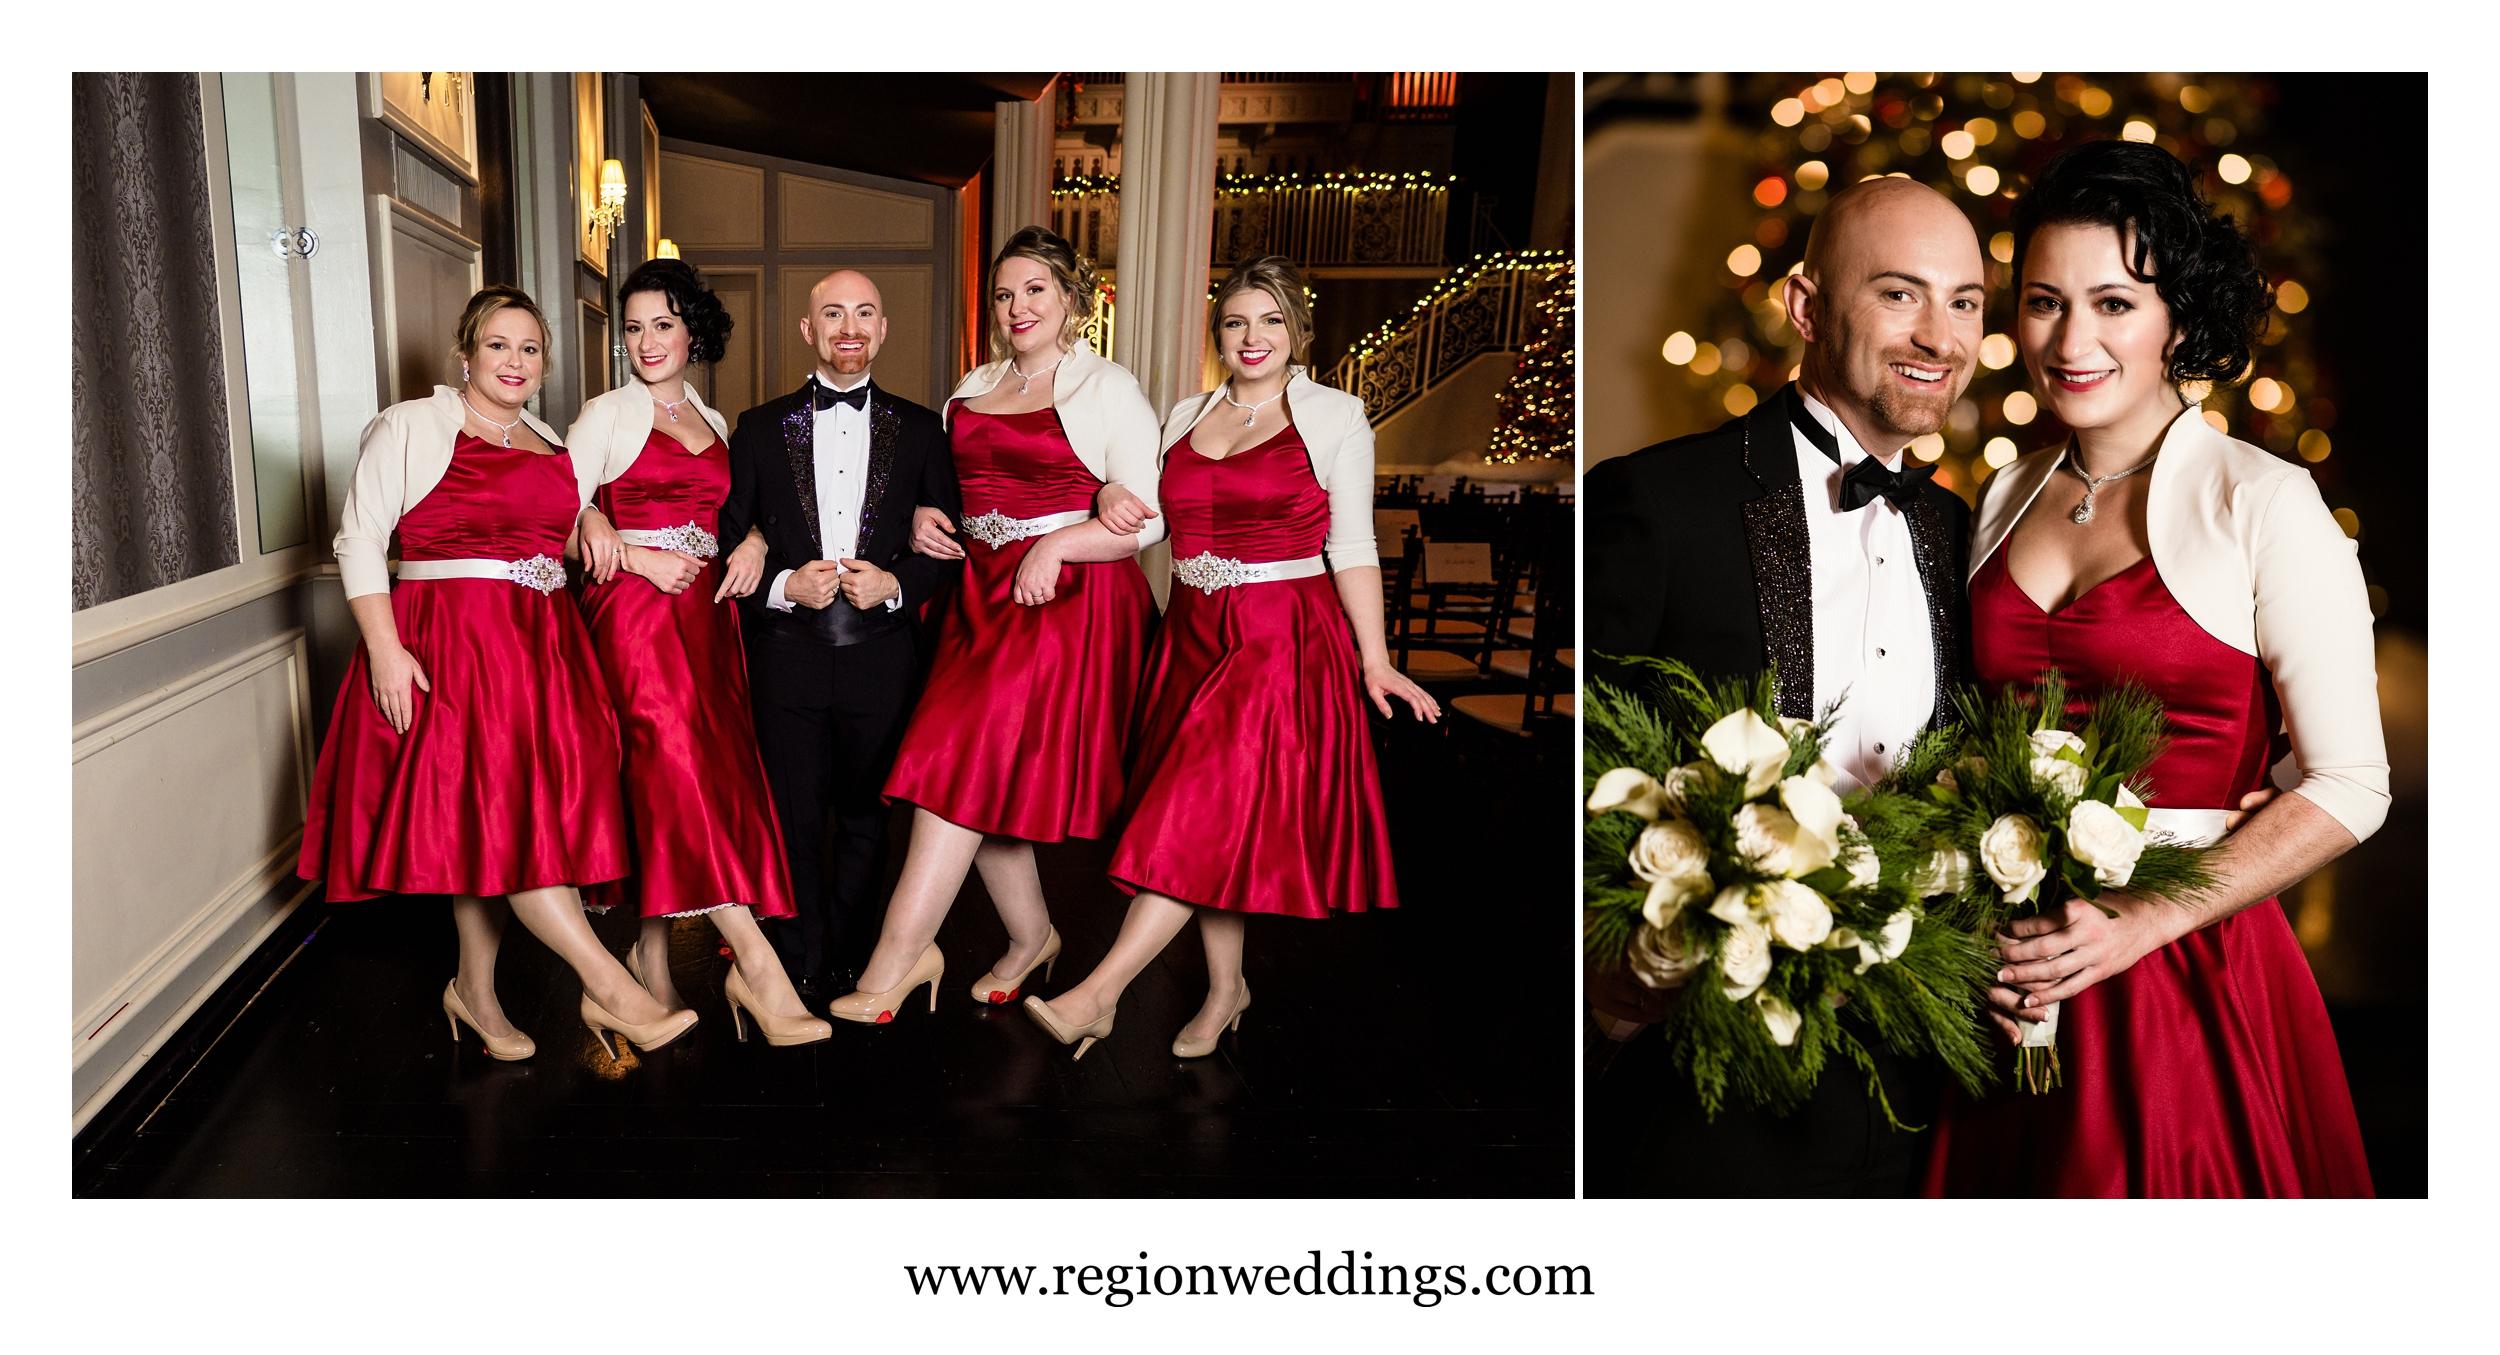 The grooms-maids kick up a leg for some fun wedding photos.